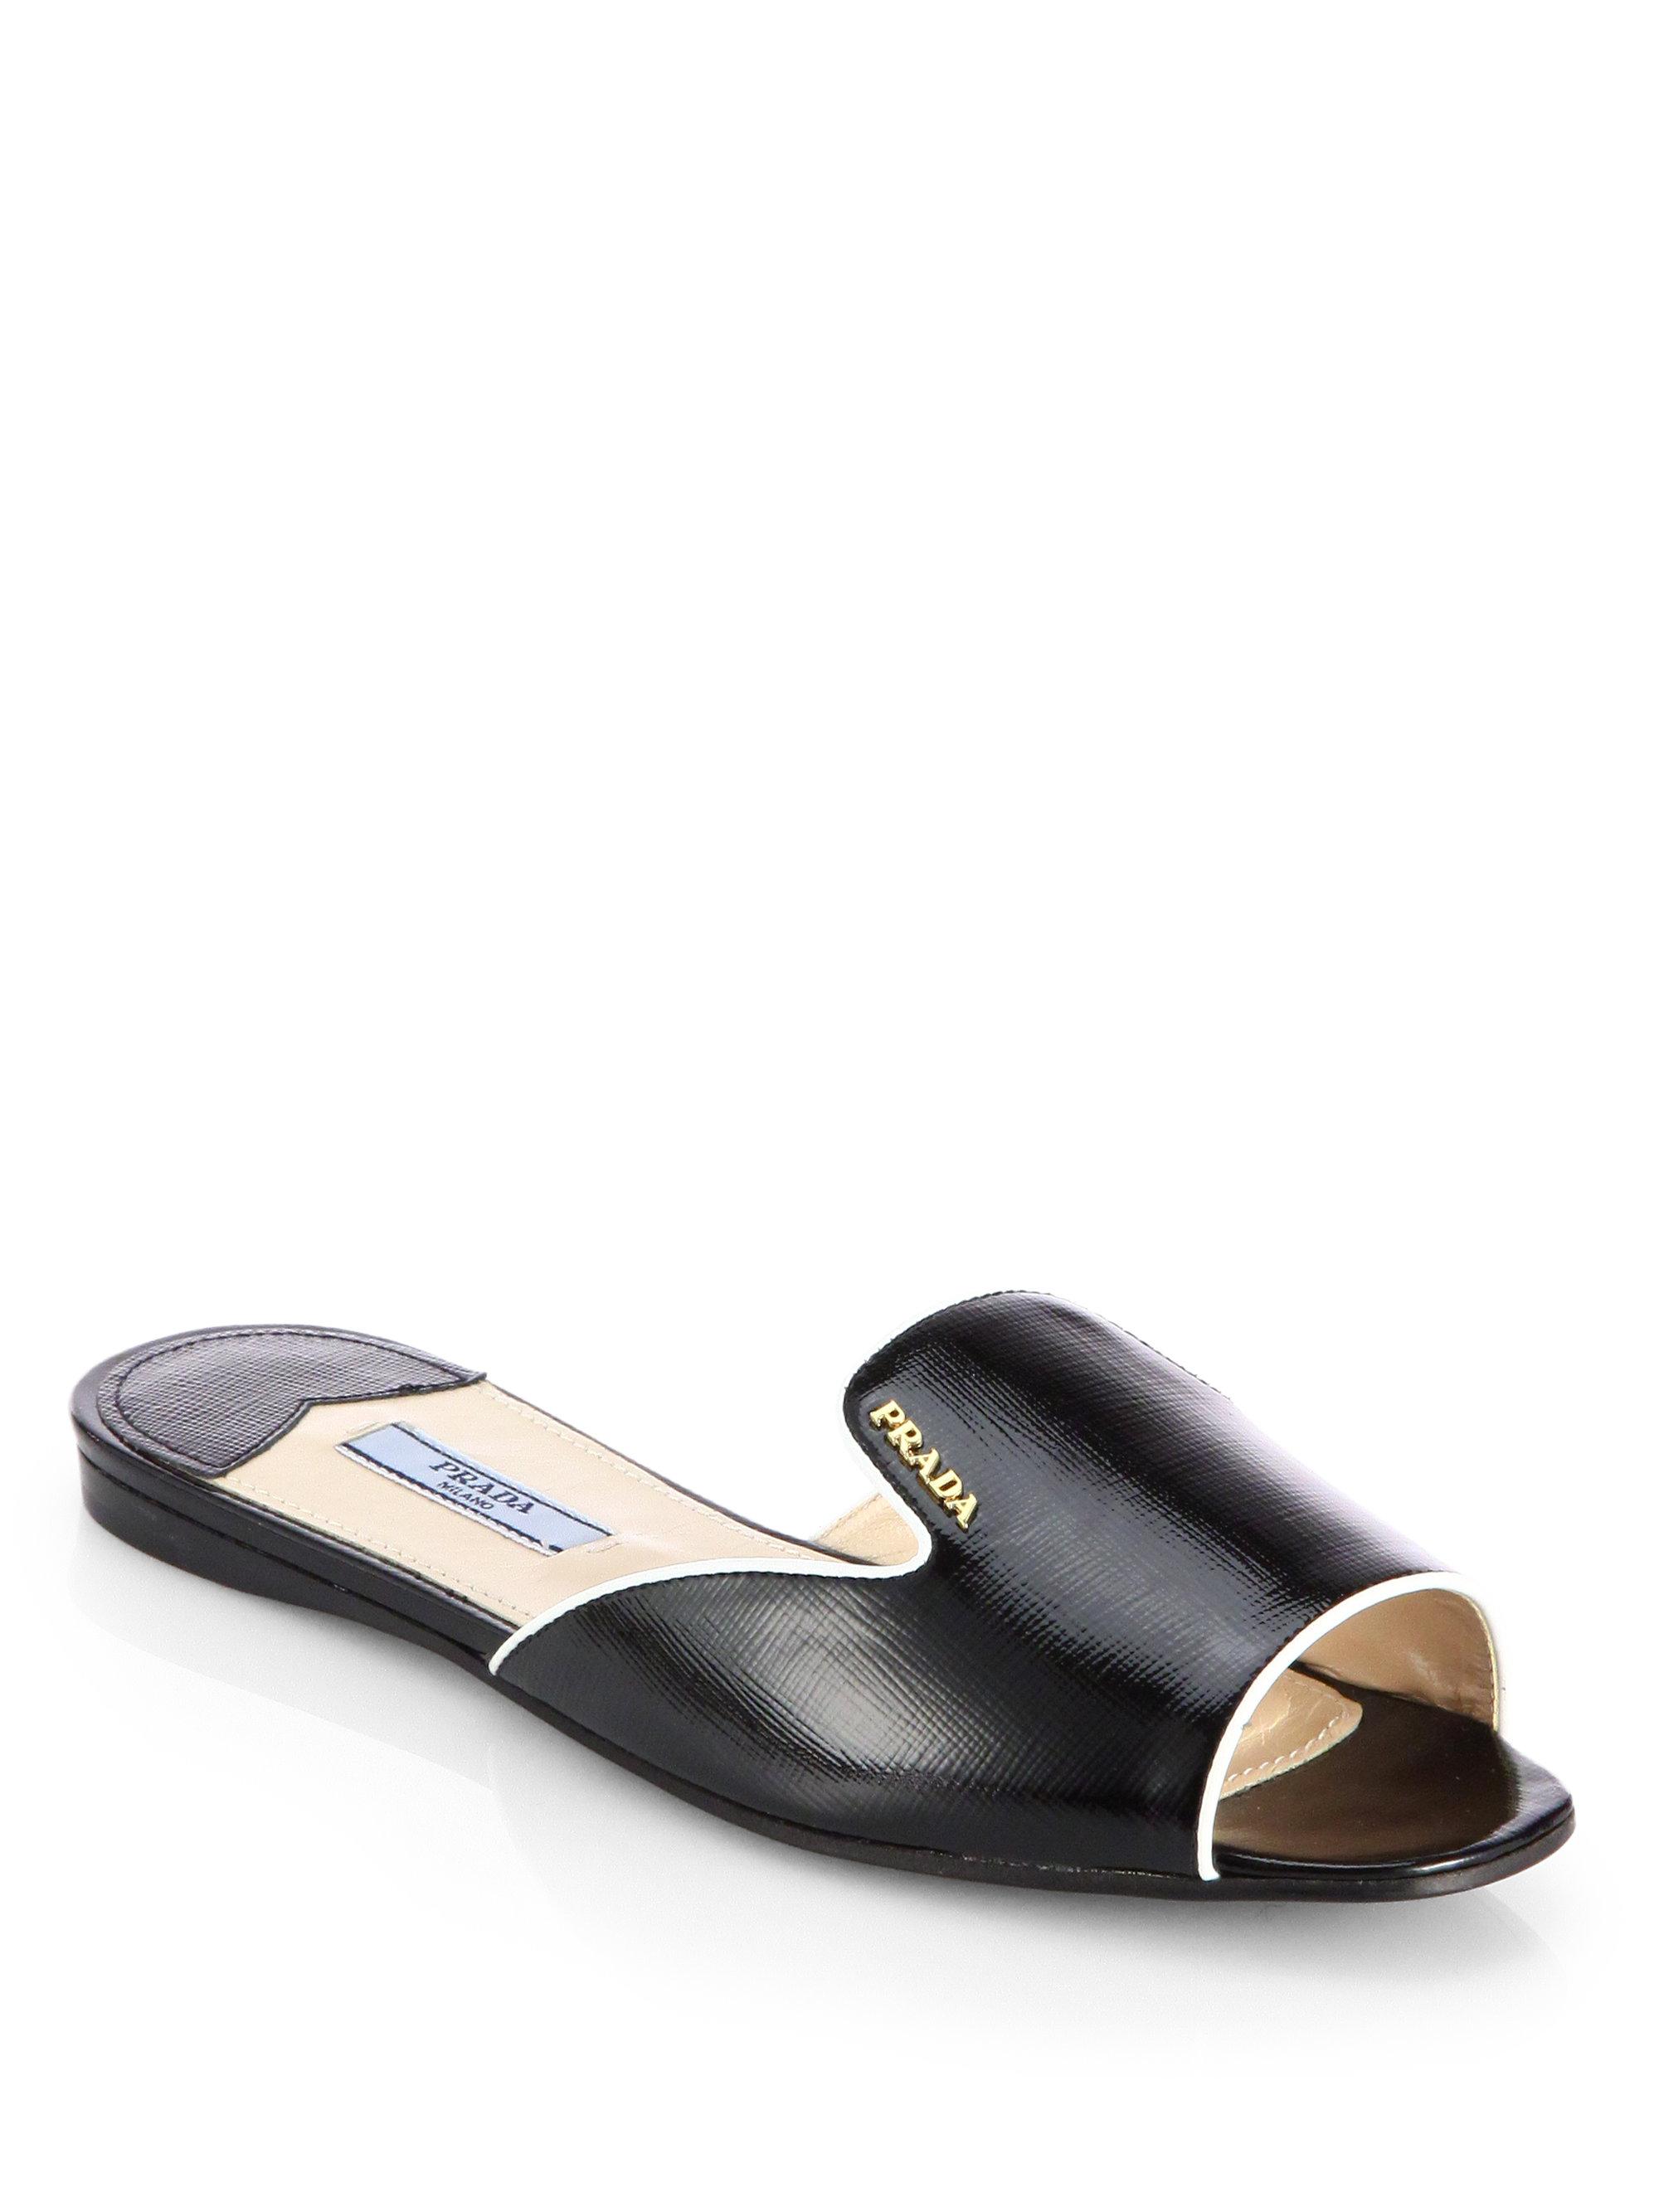 Lyst Prada Bicolor Saffiano Patent Leather Slides In Black